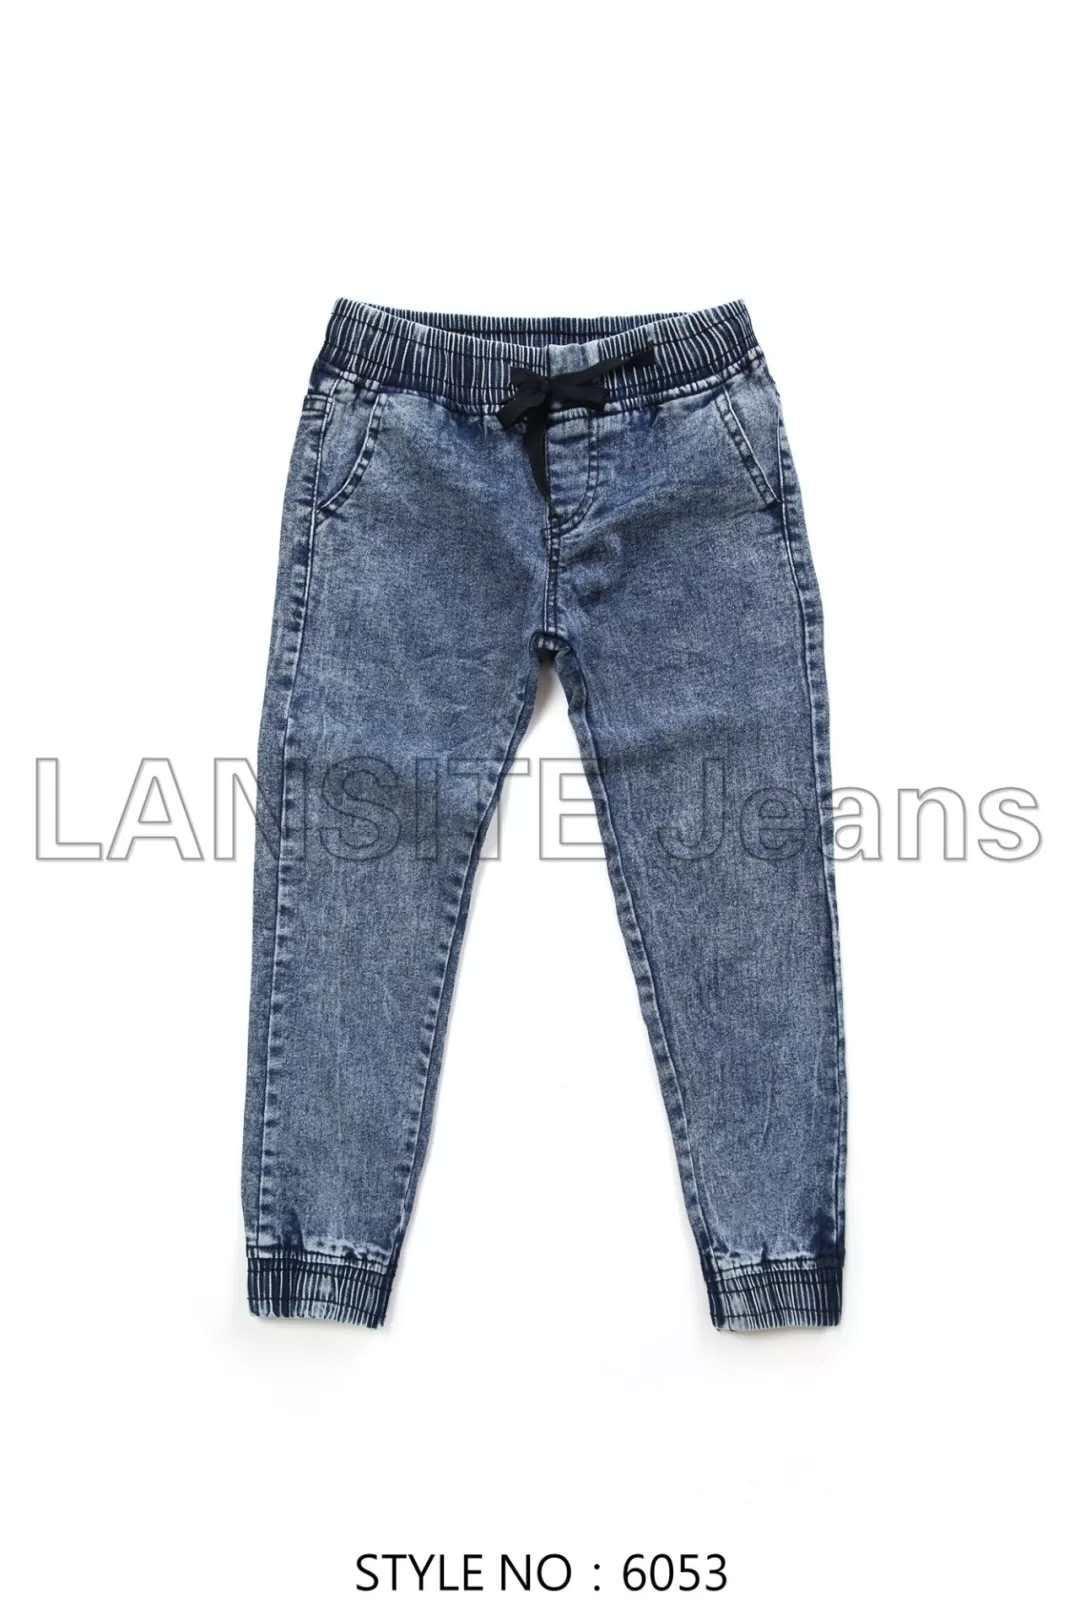 Kids Pants Jogger Pambata Maong Jogger Denim Fashion By C.y.n Shop.